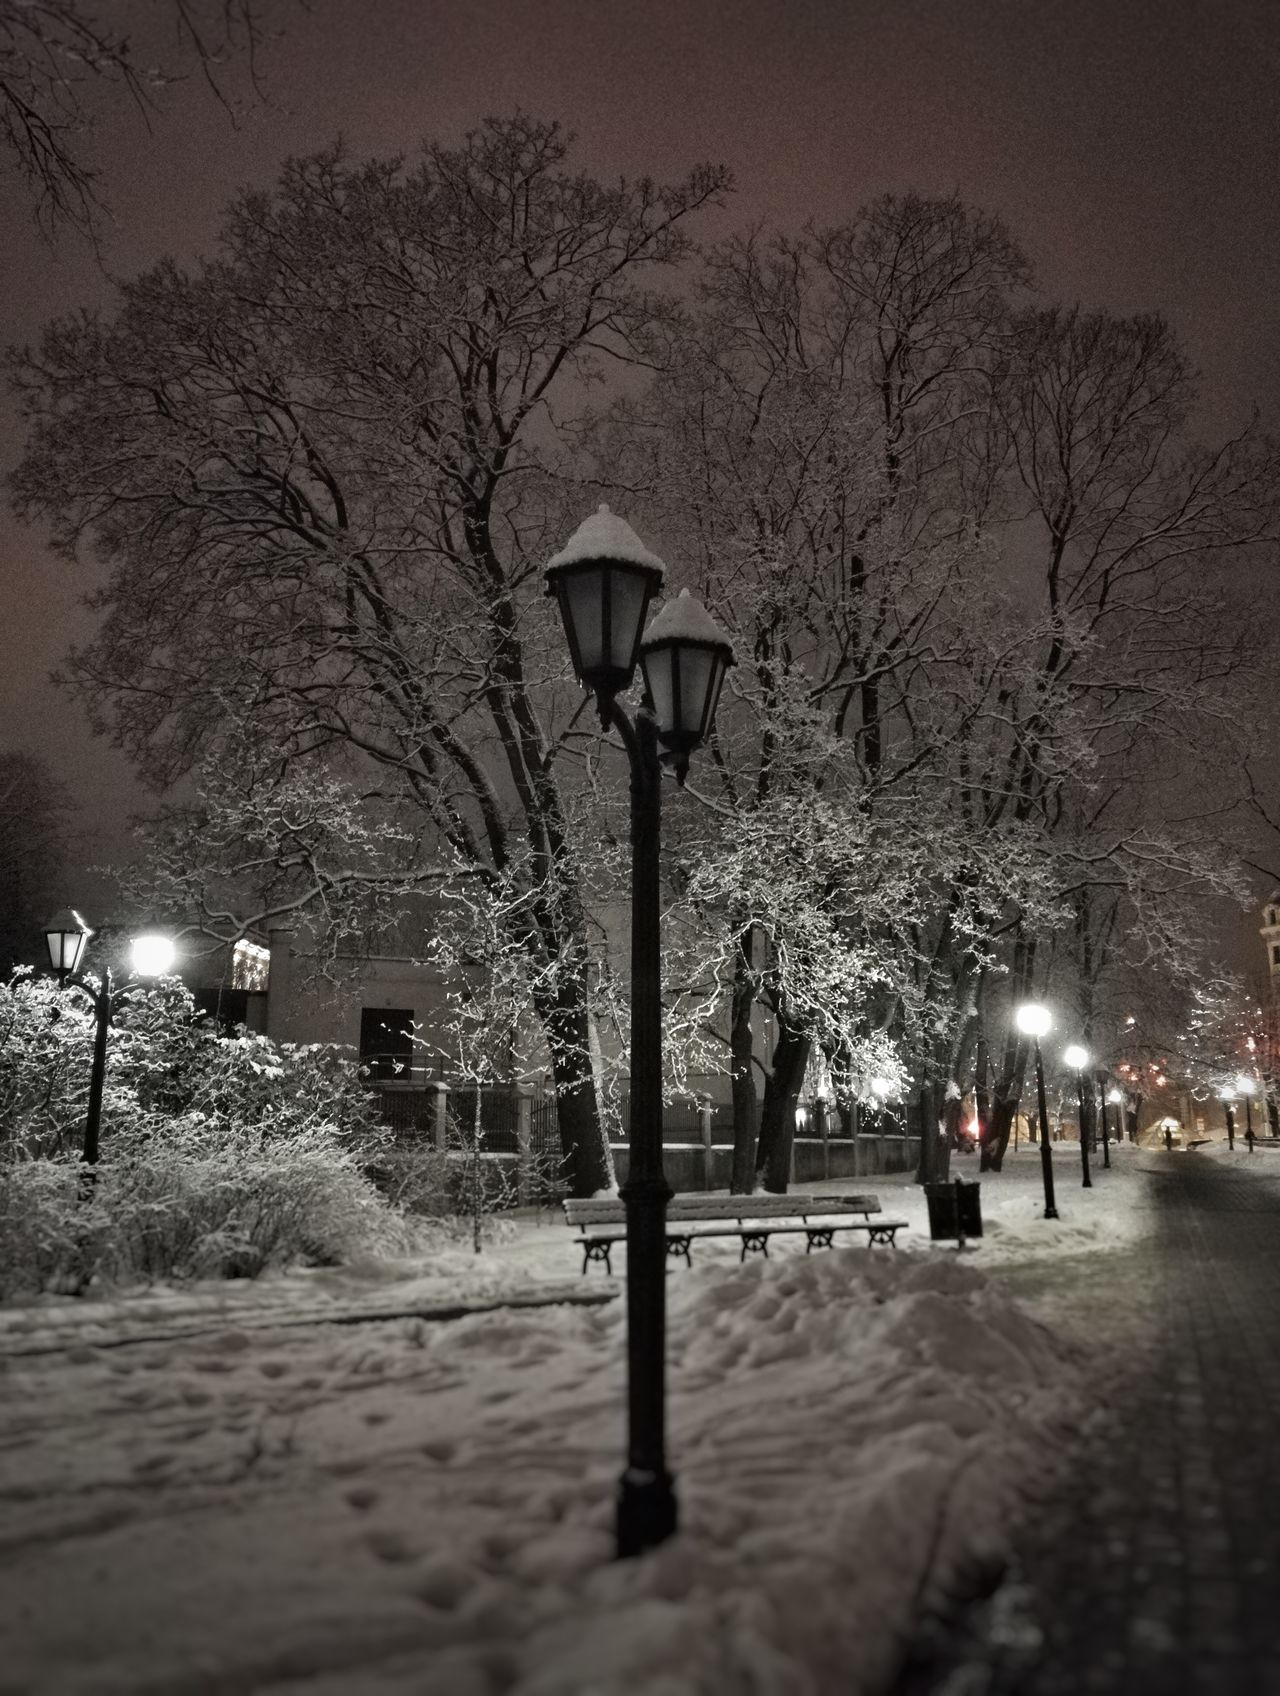 Street Light Cold Temperature Tranquility Winter Black And White Enjoying Life Snow Hello World Weather Night City Tree Lantern